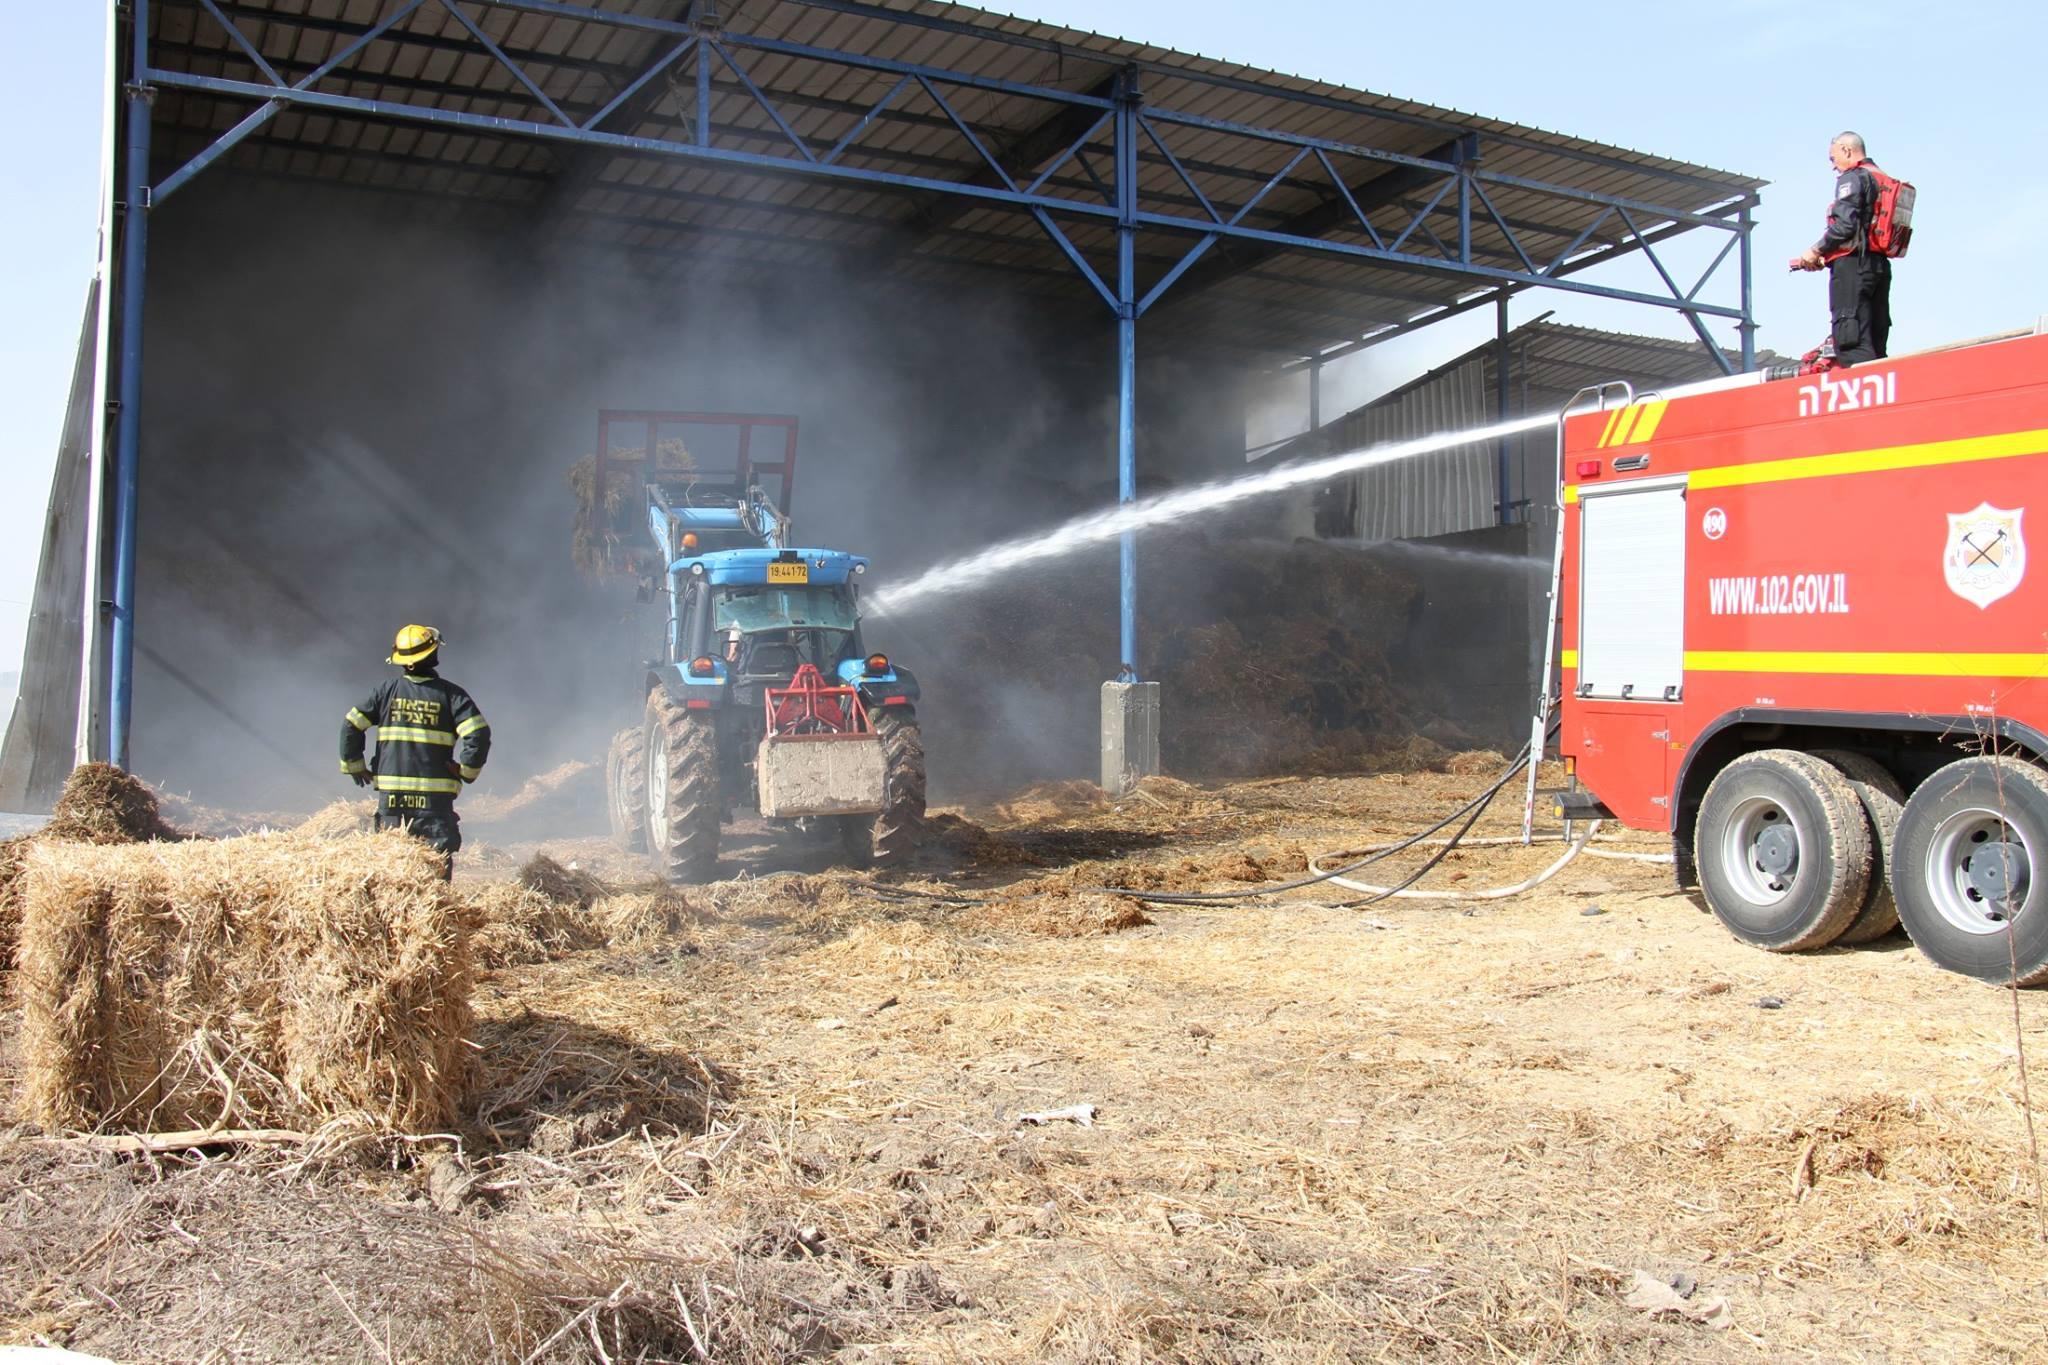 Fire at Kfar Silver